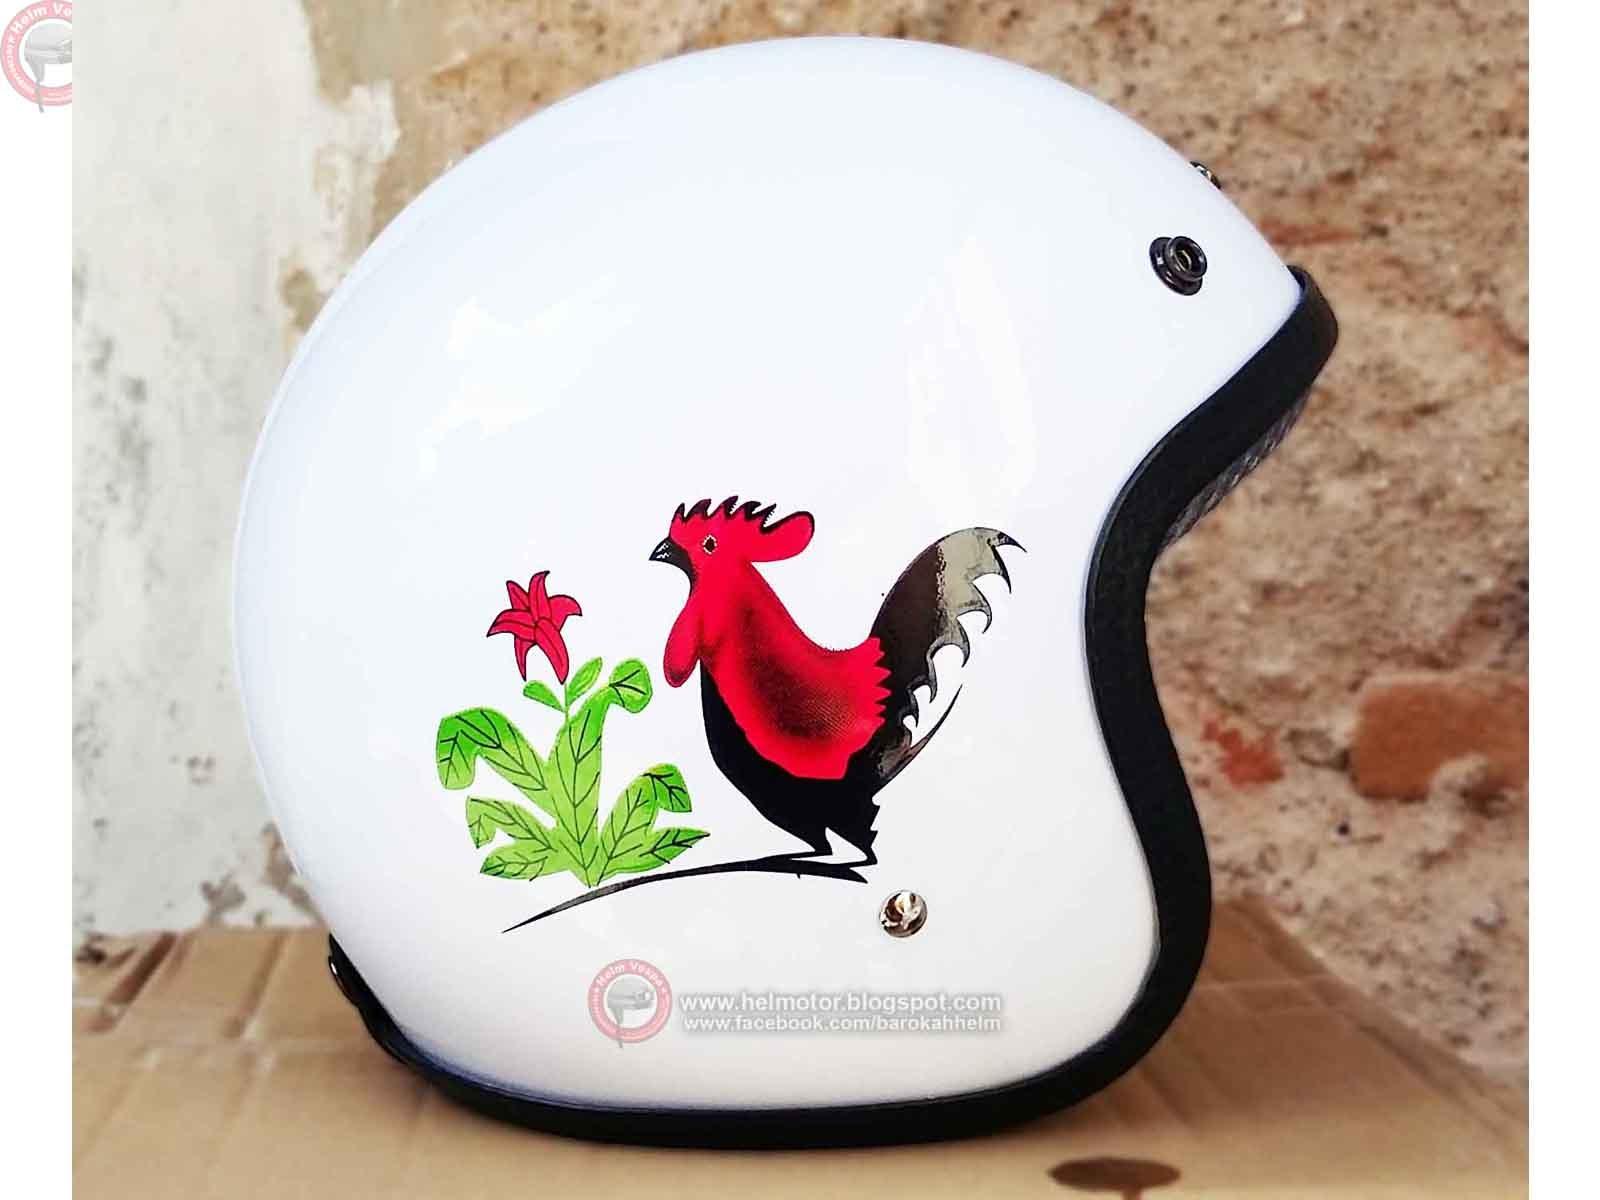 Helm Retro Bogo Ayam  Helm Vespa